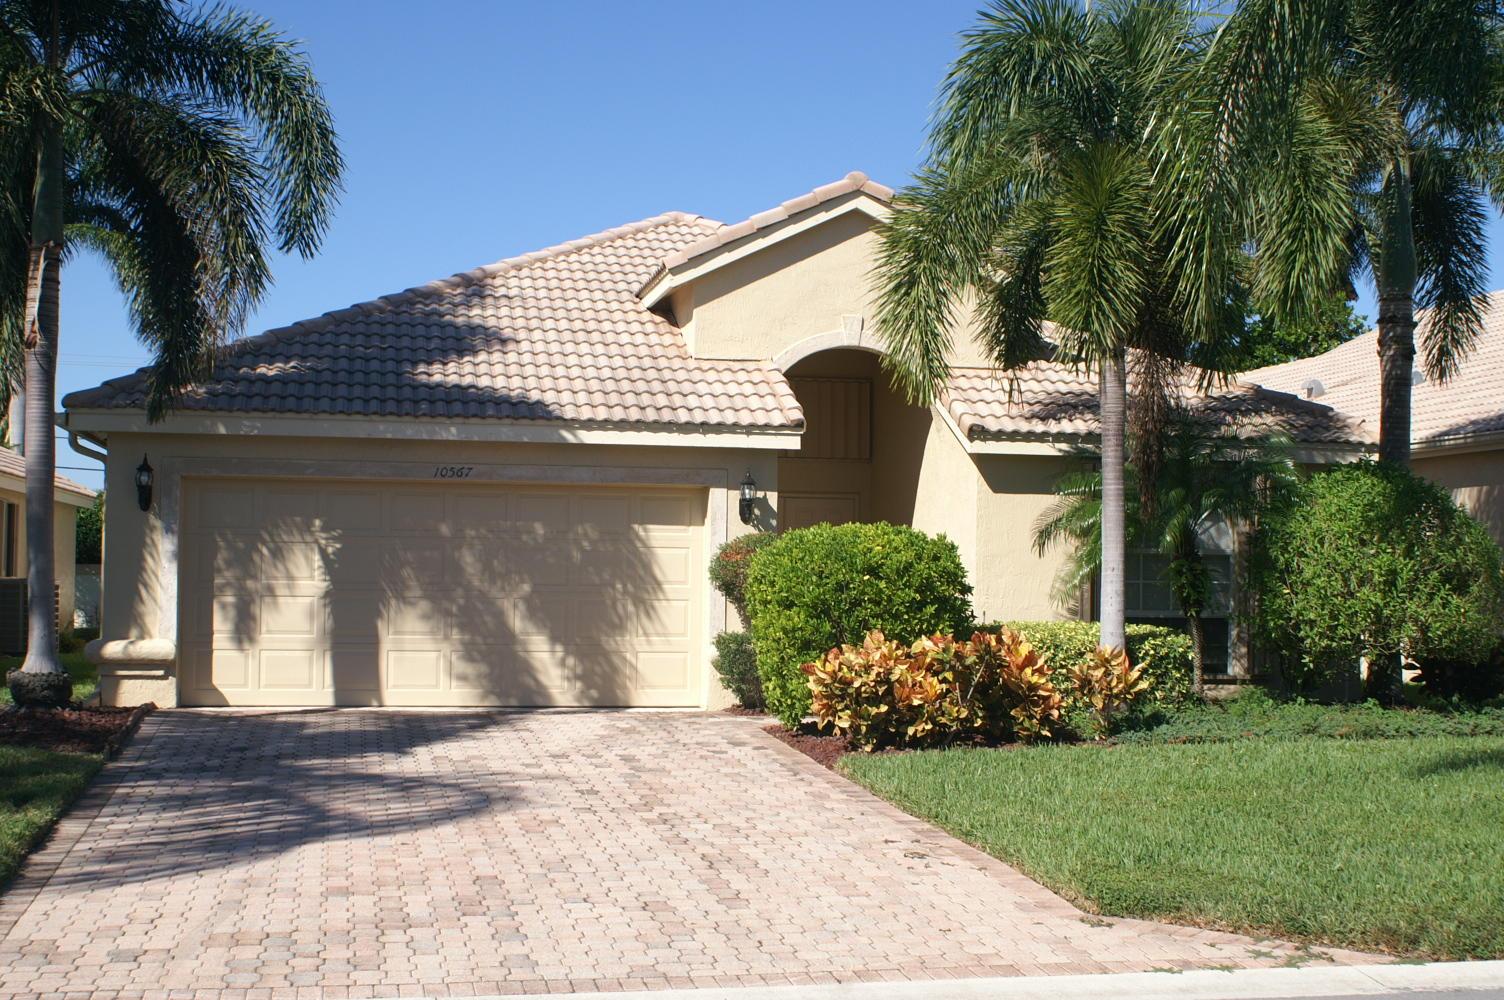 10567 Palladium Gates Way Boynton Beach, FL 33436